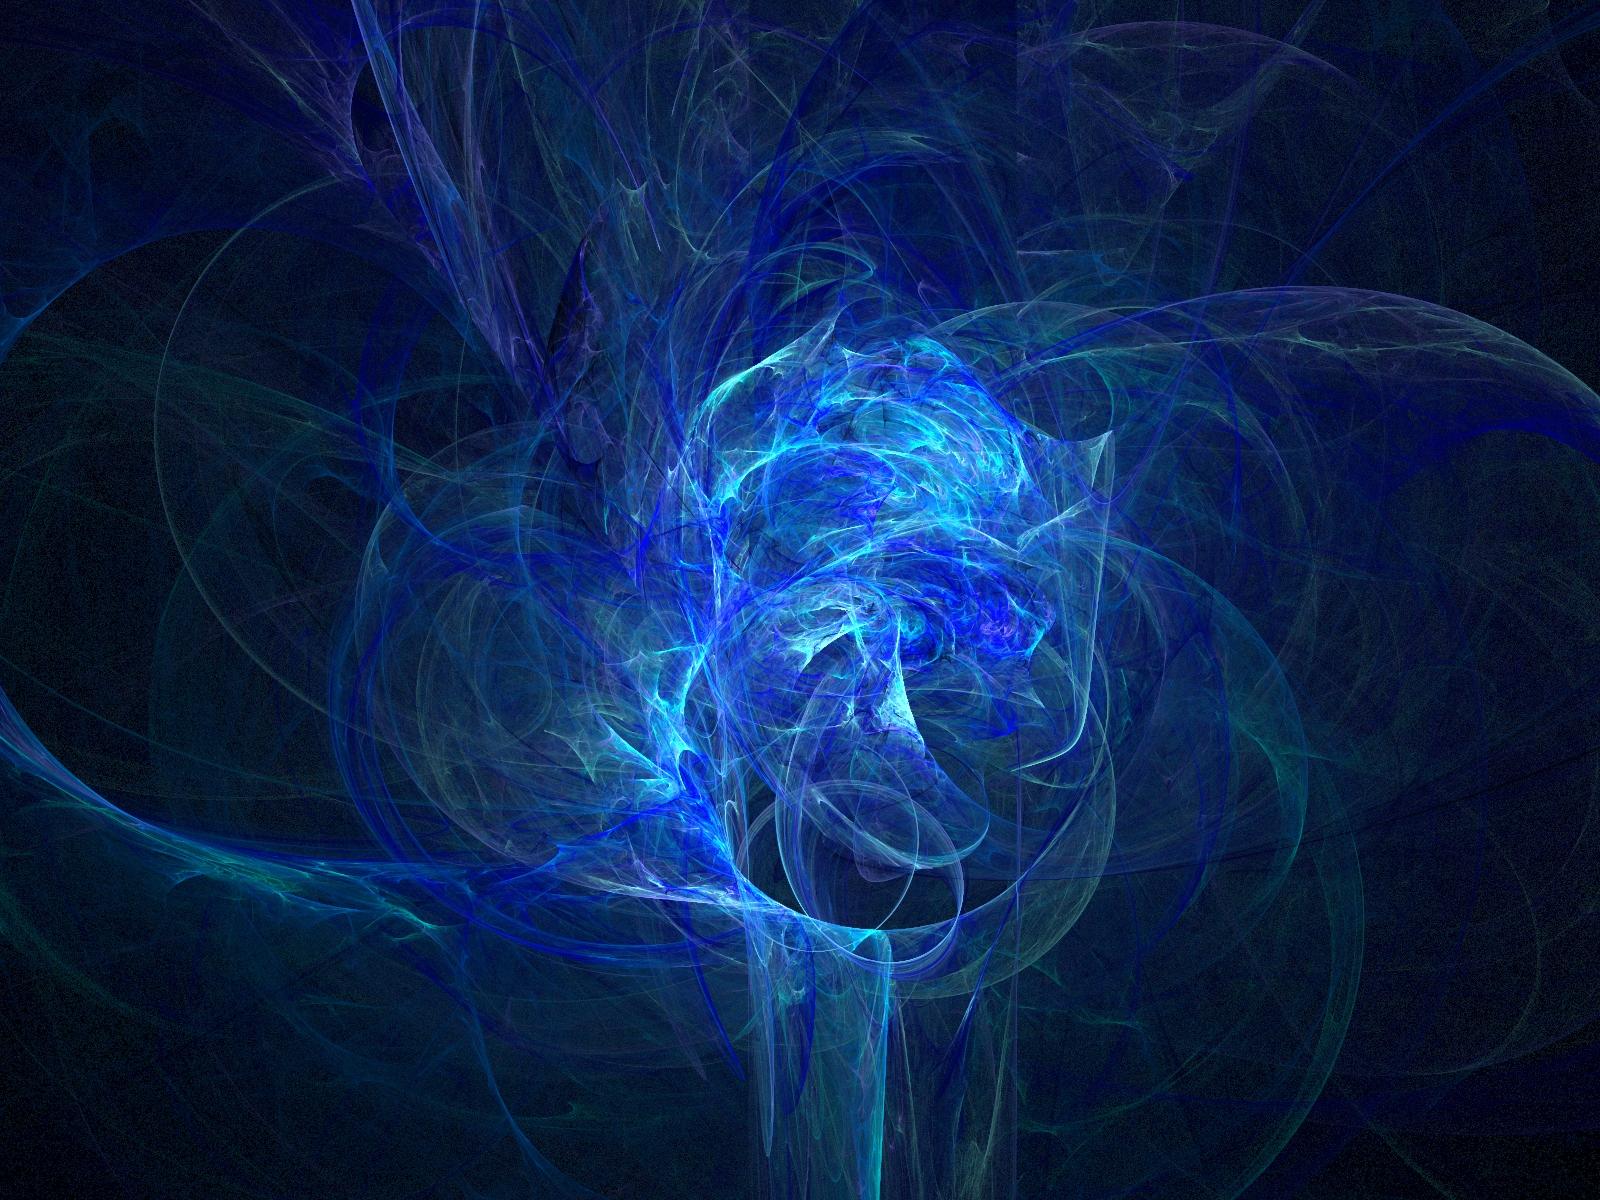 Abstract Blue Smoke Render Desktop Wallpaper